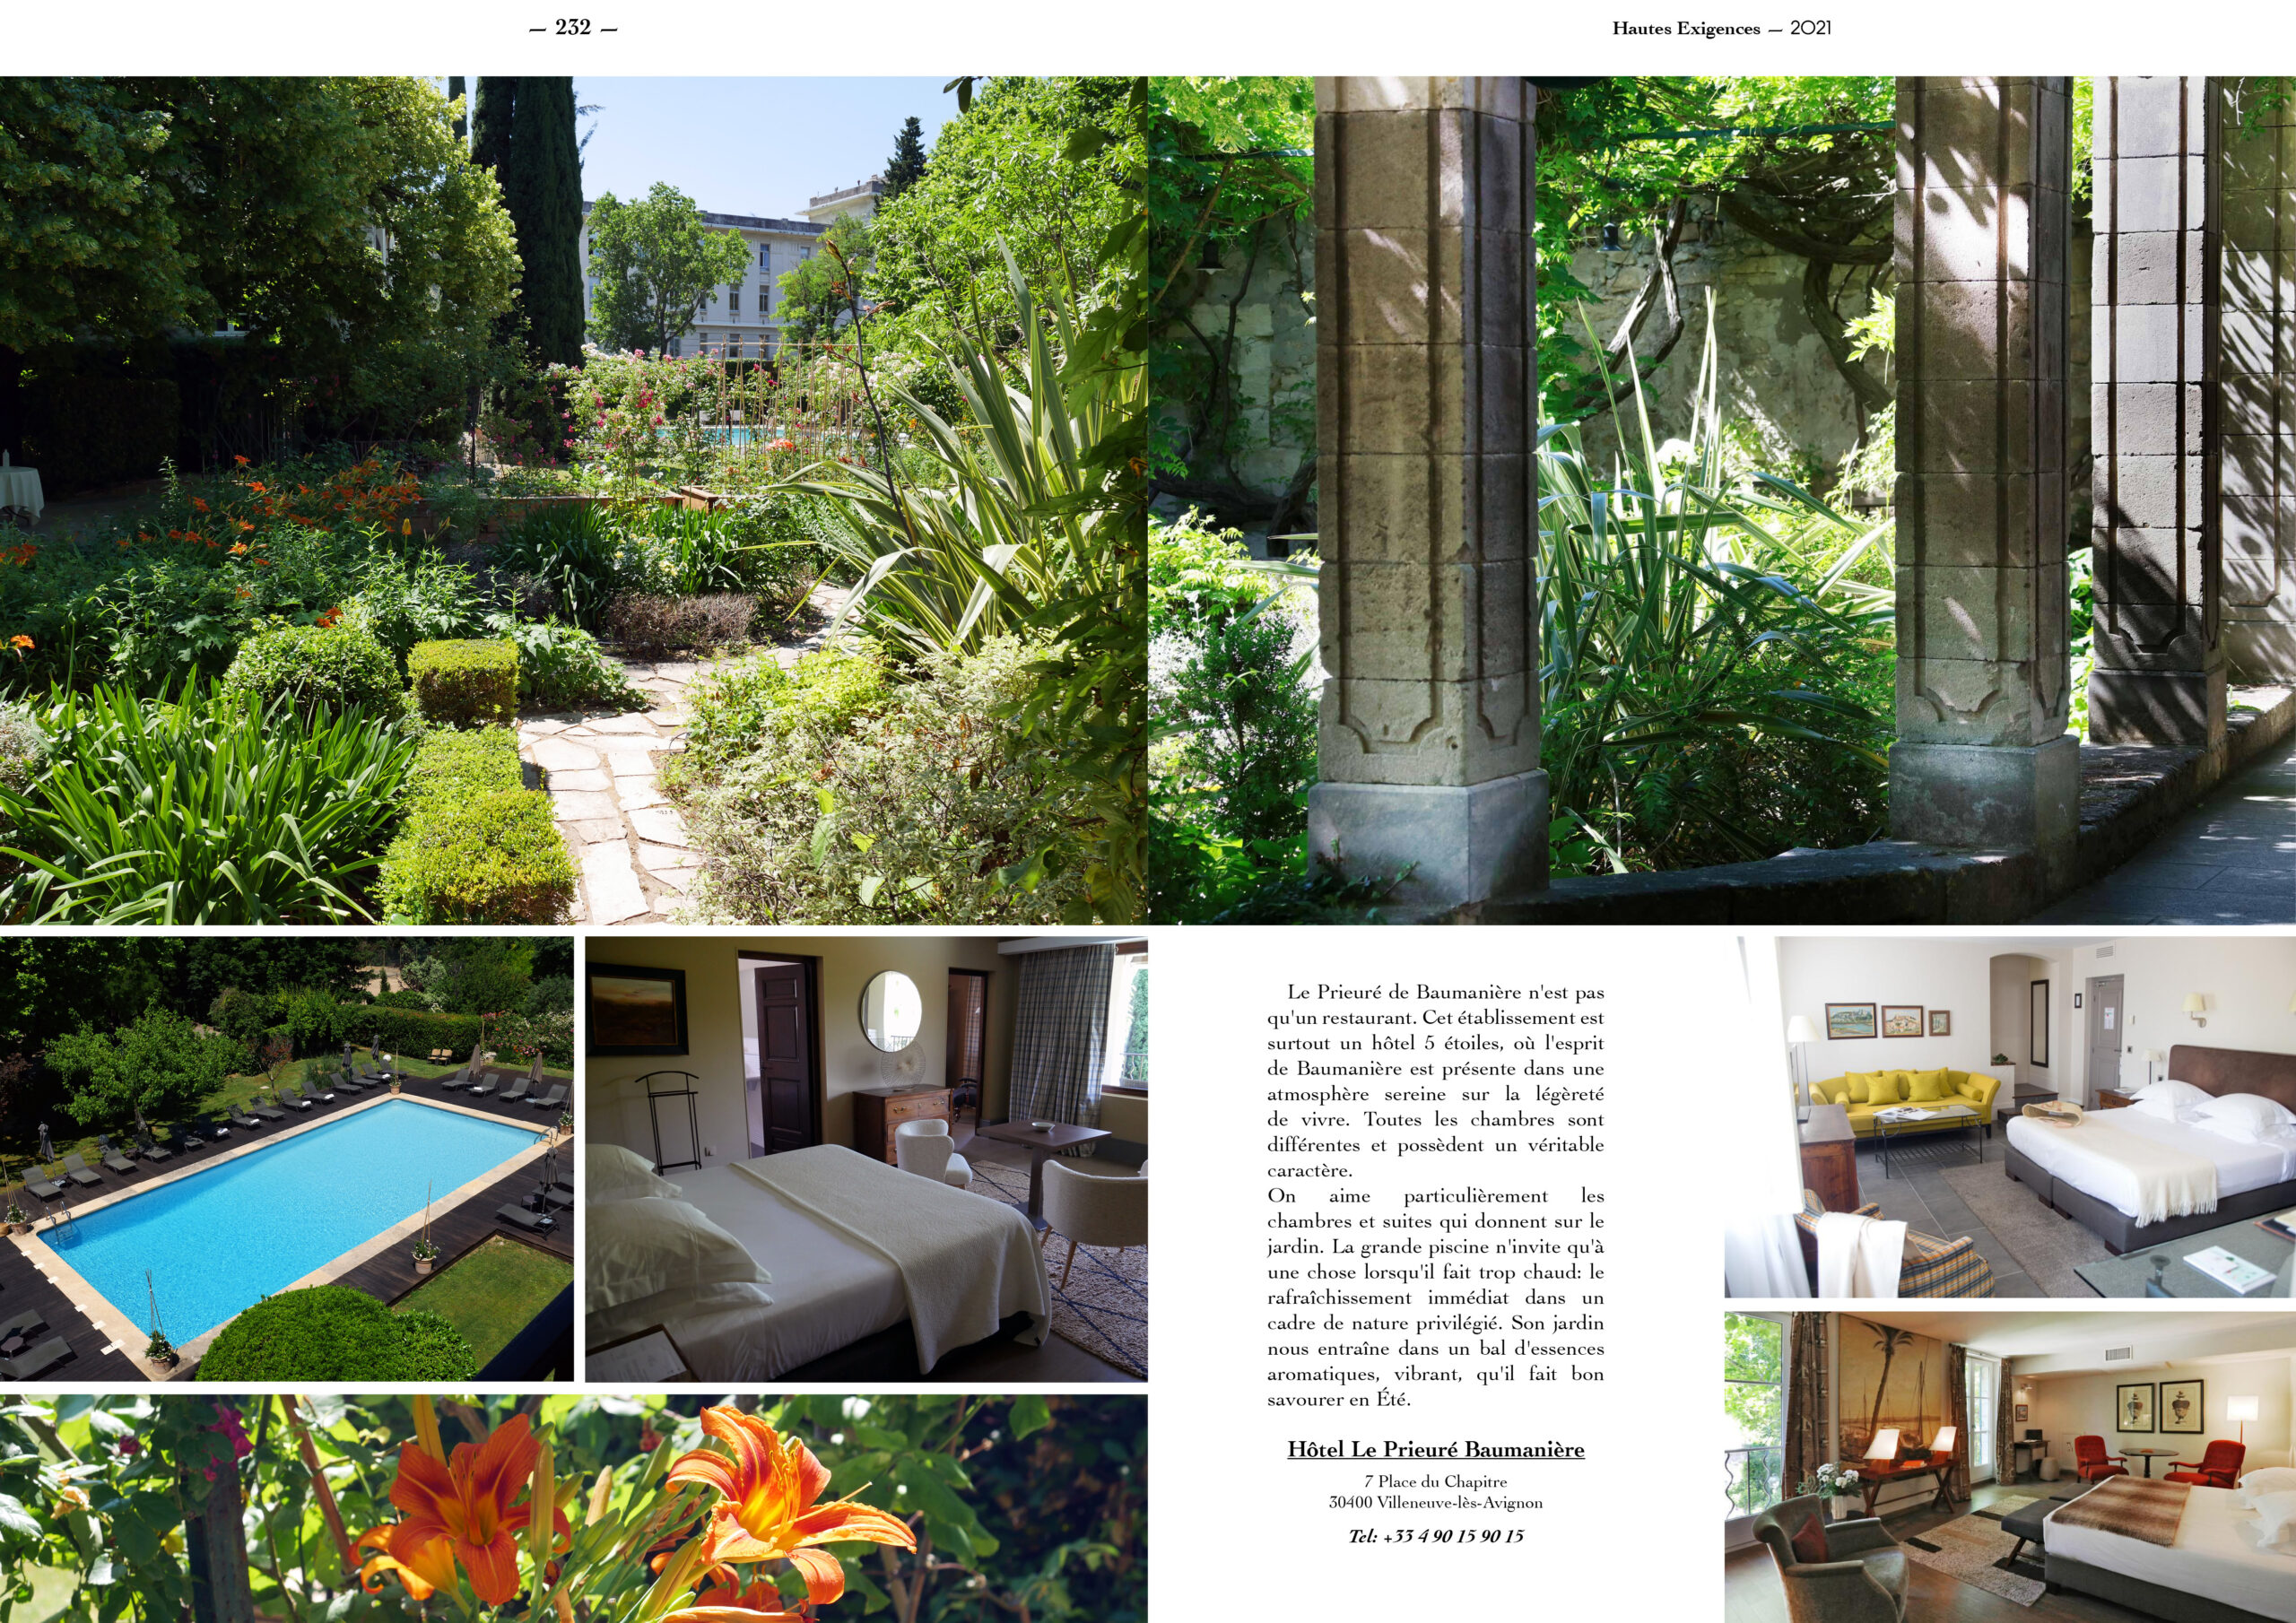 Hautes Exigences Magazine Hors Serie 2021 page 230-231